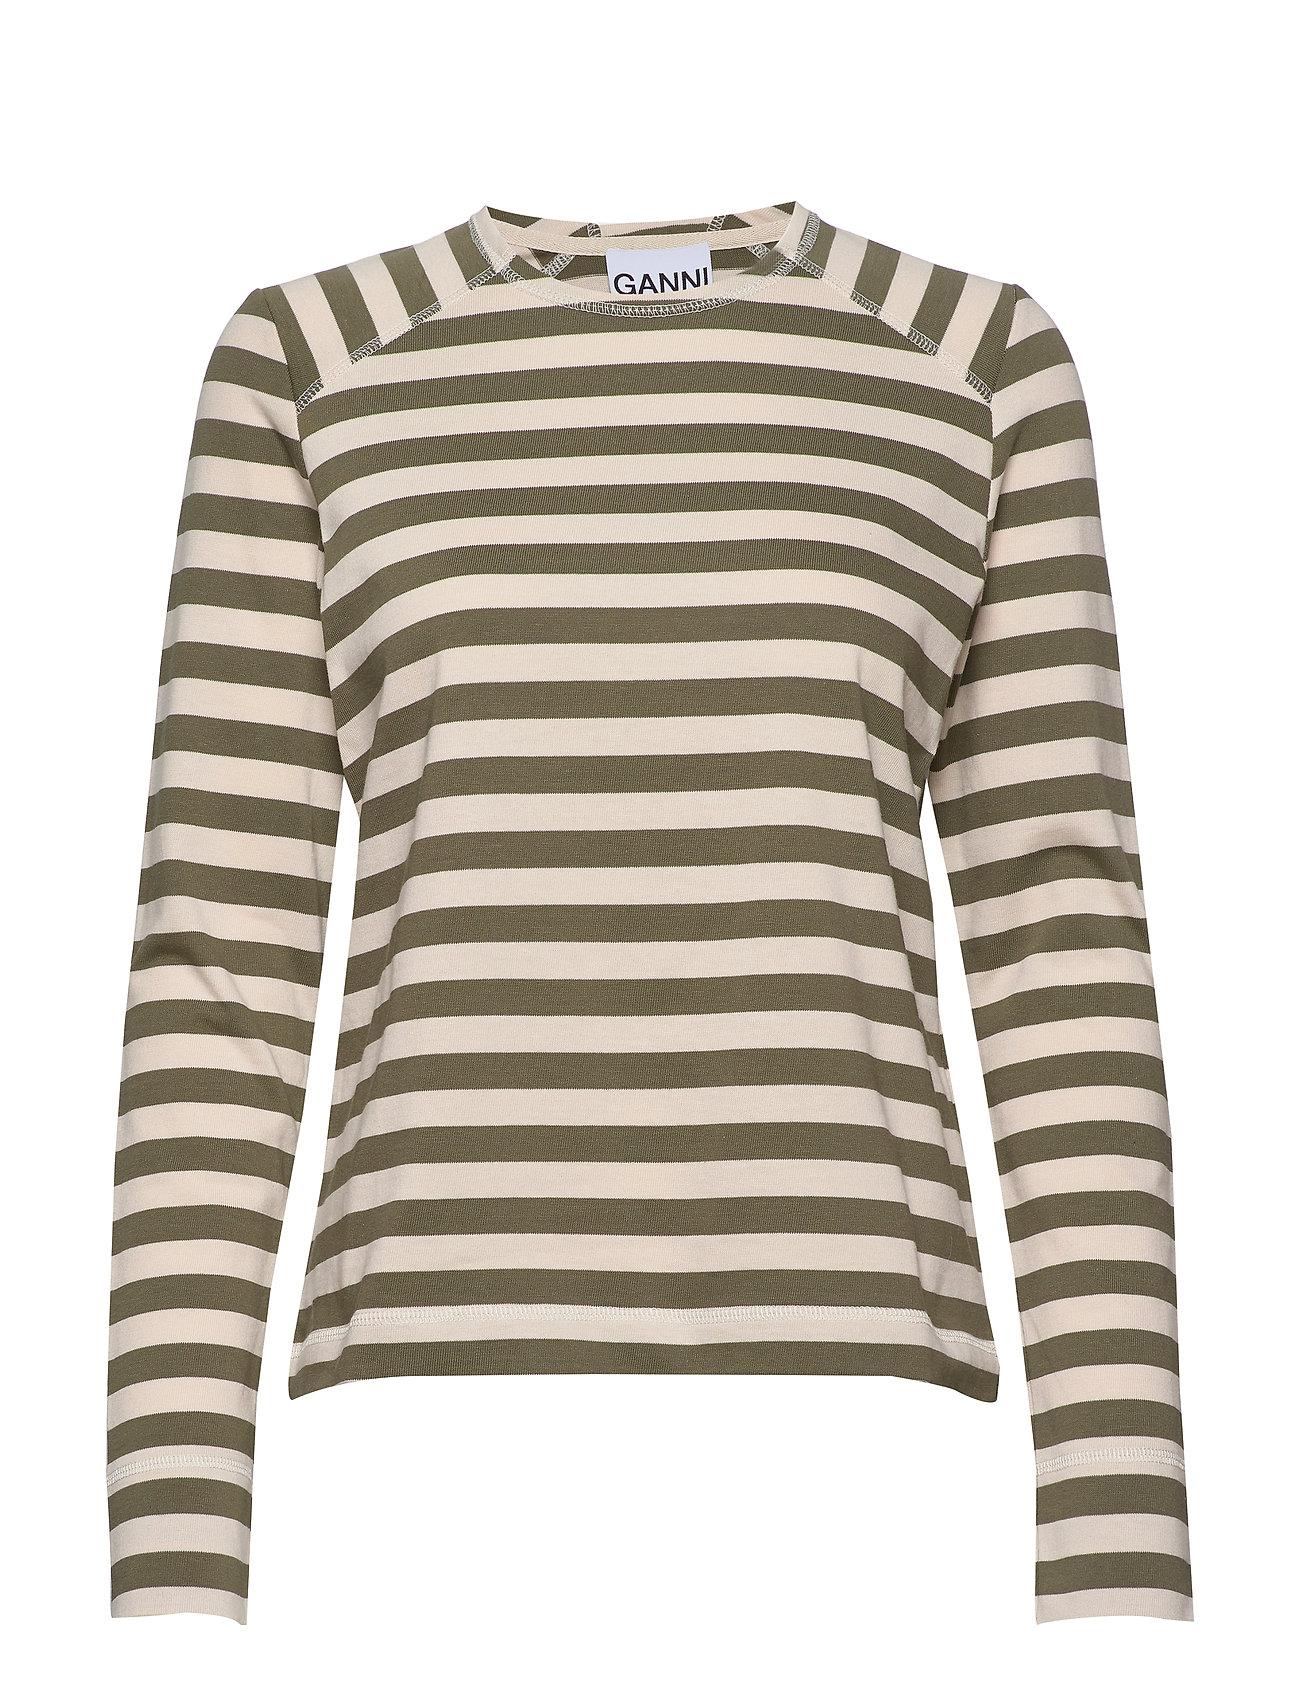 Ganni Striped Cotton Jersey - KALAMATA